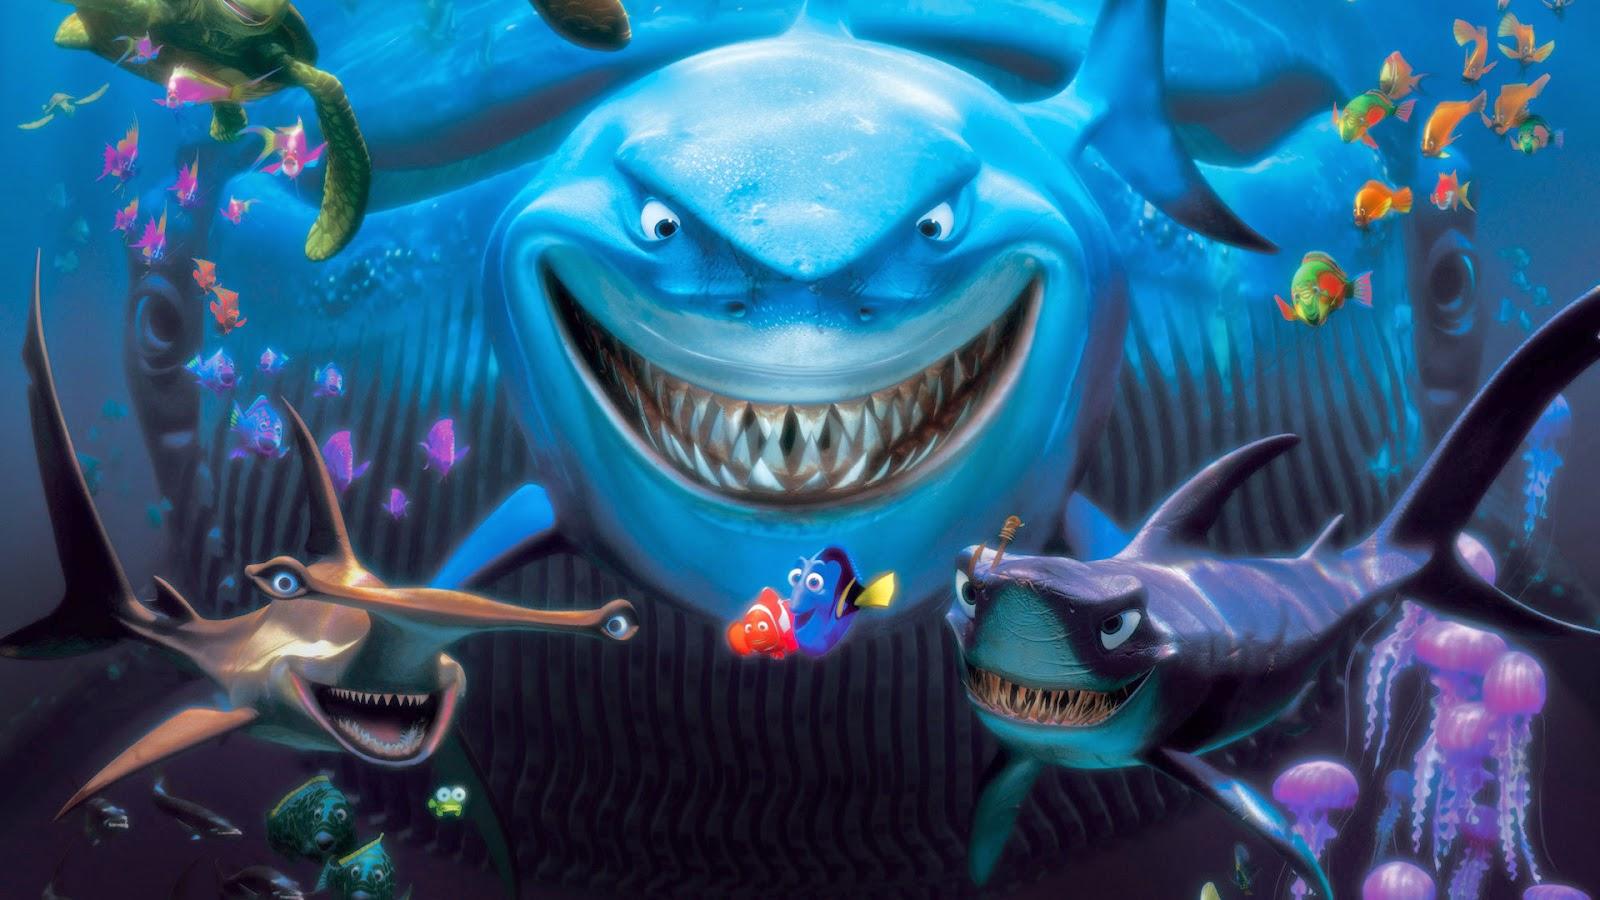 Finding Nemo D Animasi Hd Wallpaper: WALLPAPER ACTION: 5 Film Animasi Paling Populer Di Dunia